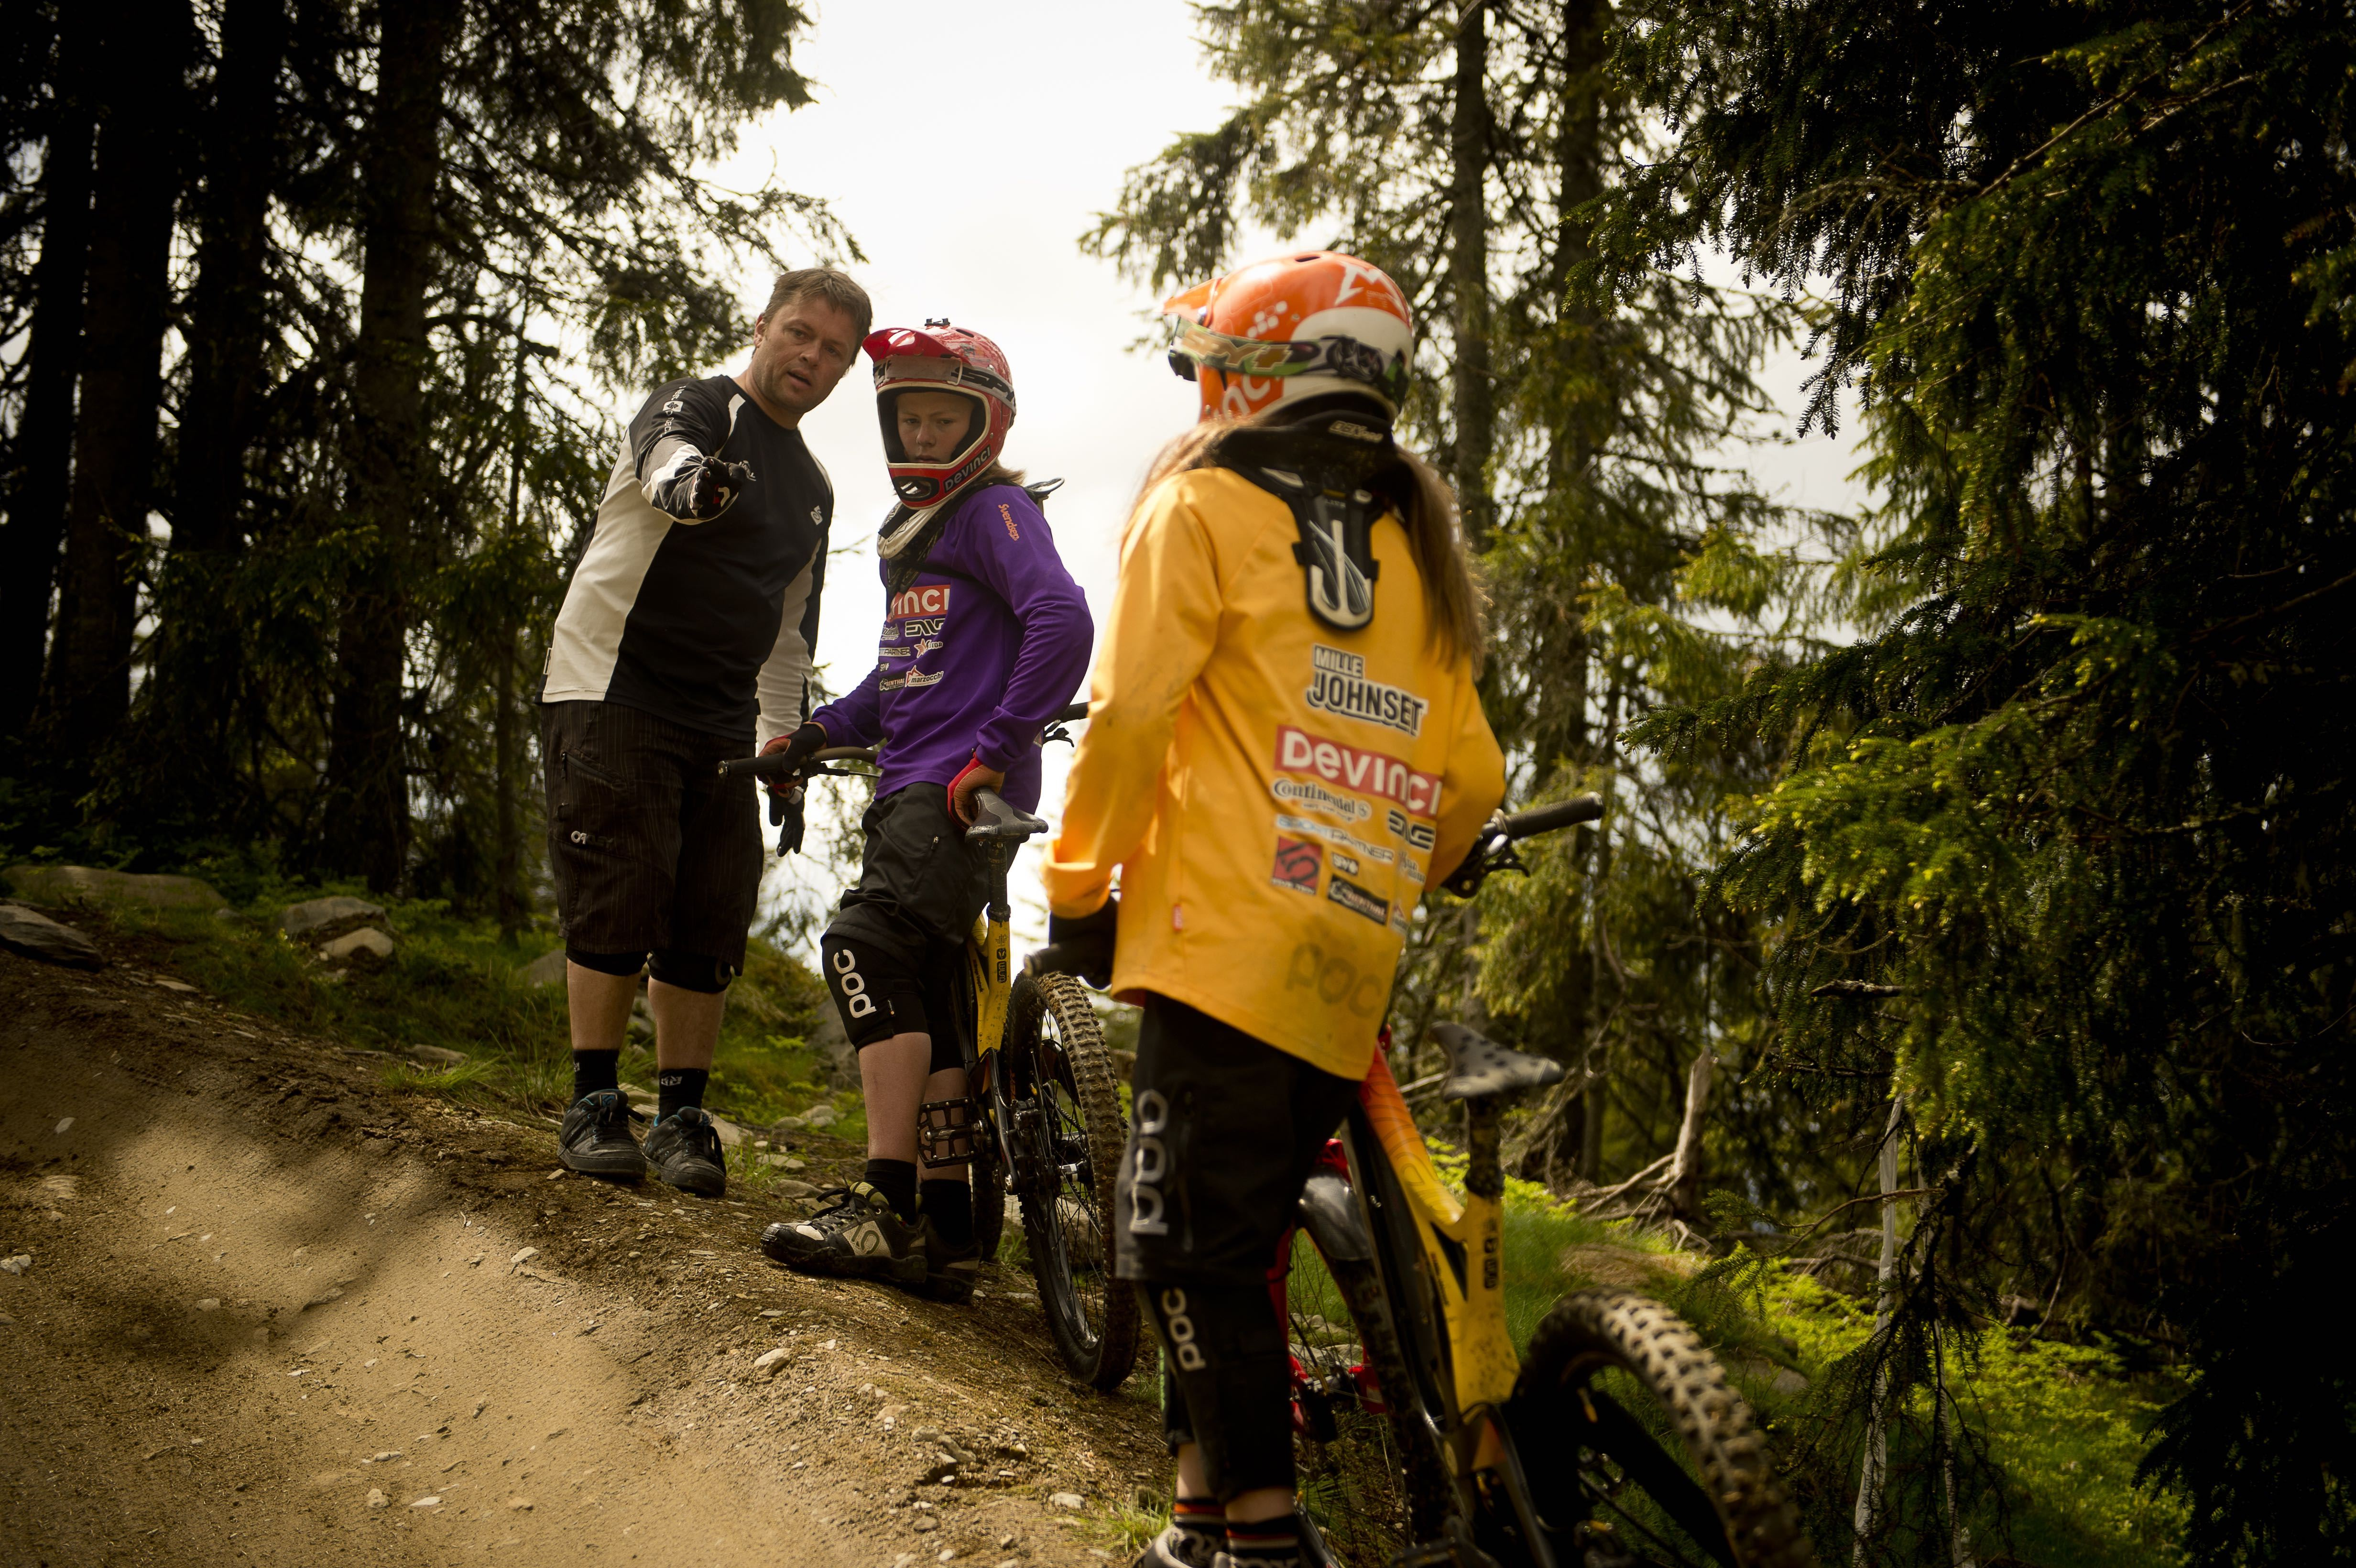 Privat Guide downhill - Hafjell Sykkelskole (90 min)